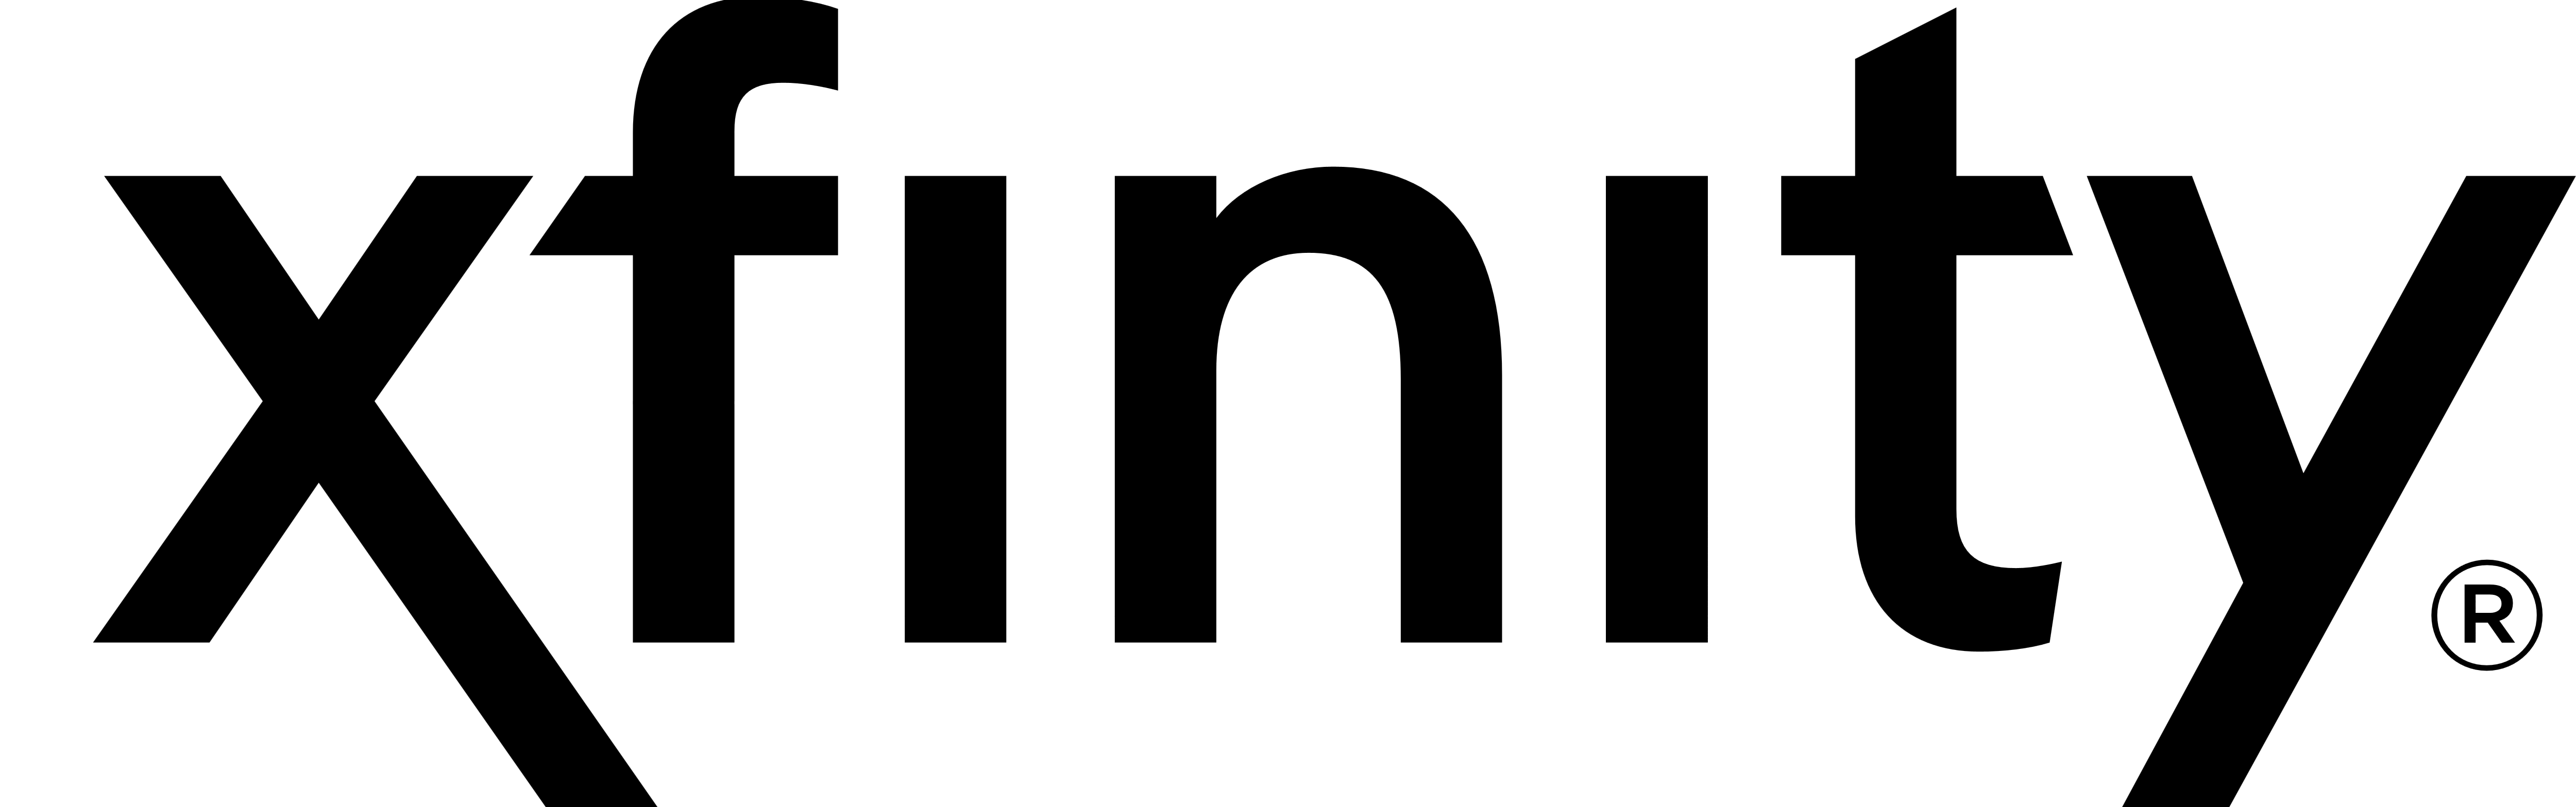 xfinity � logos download